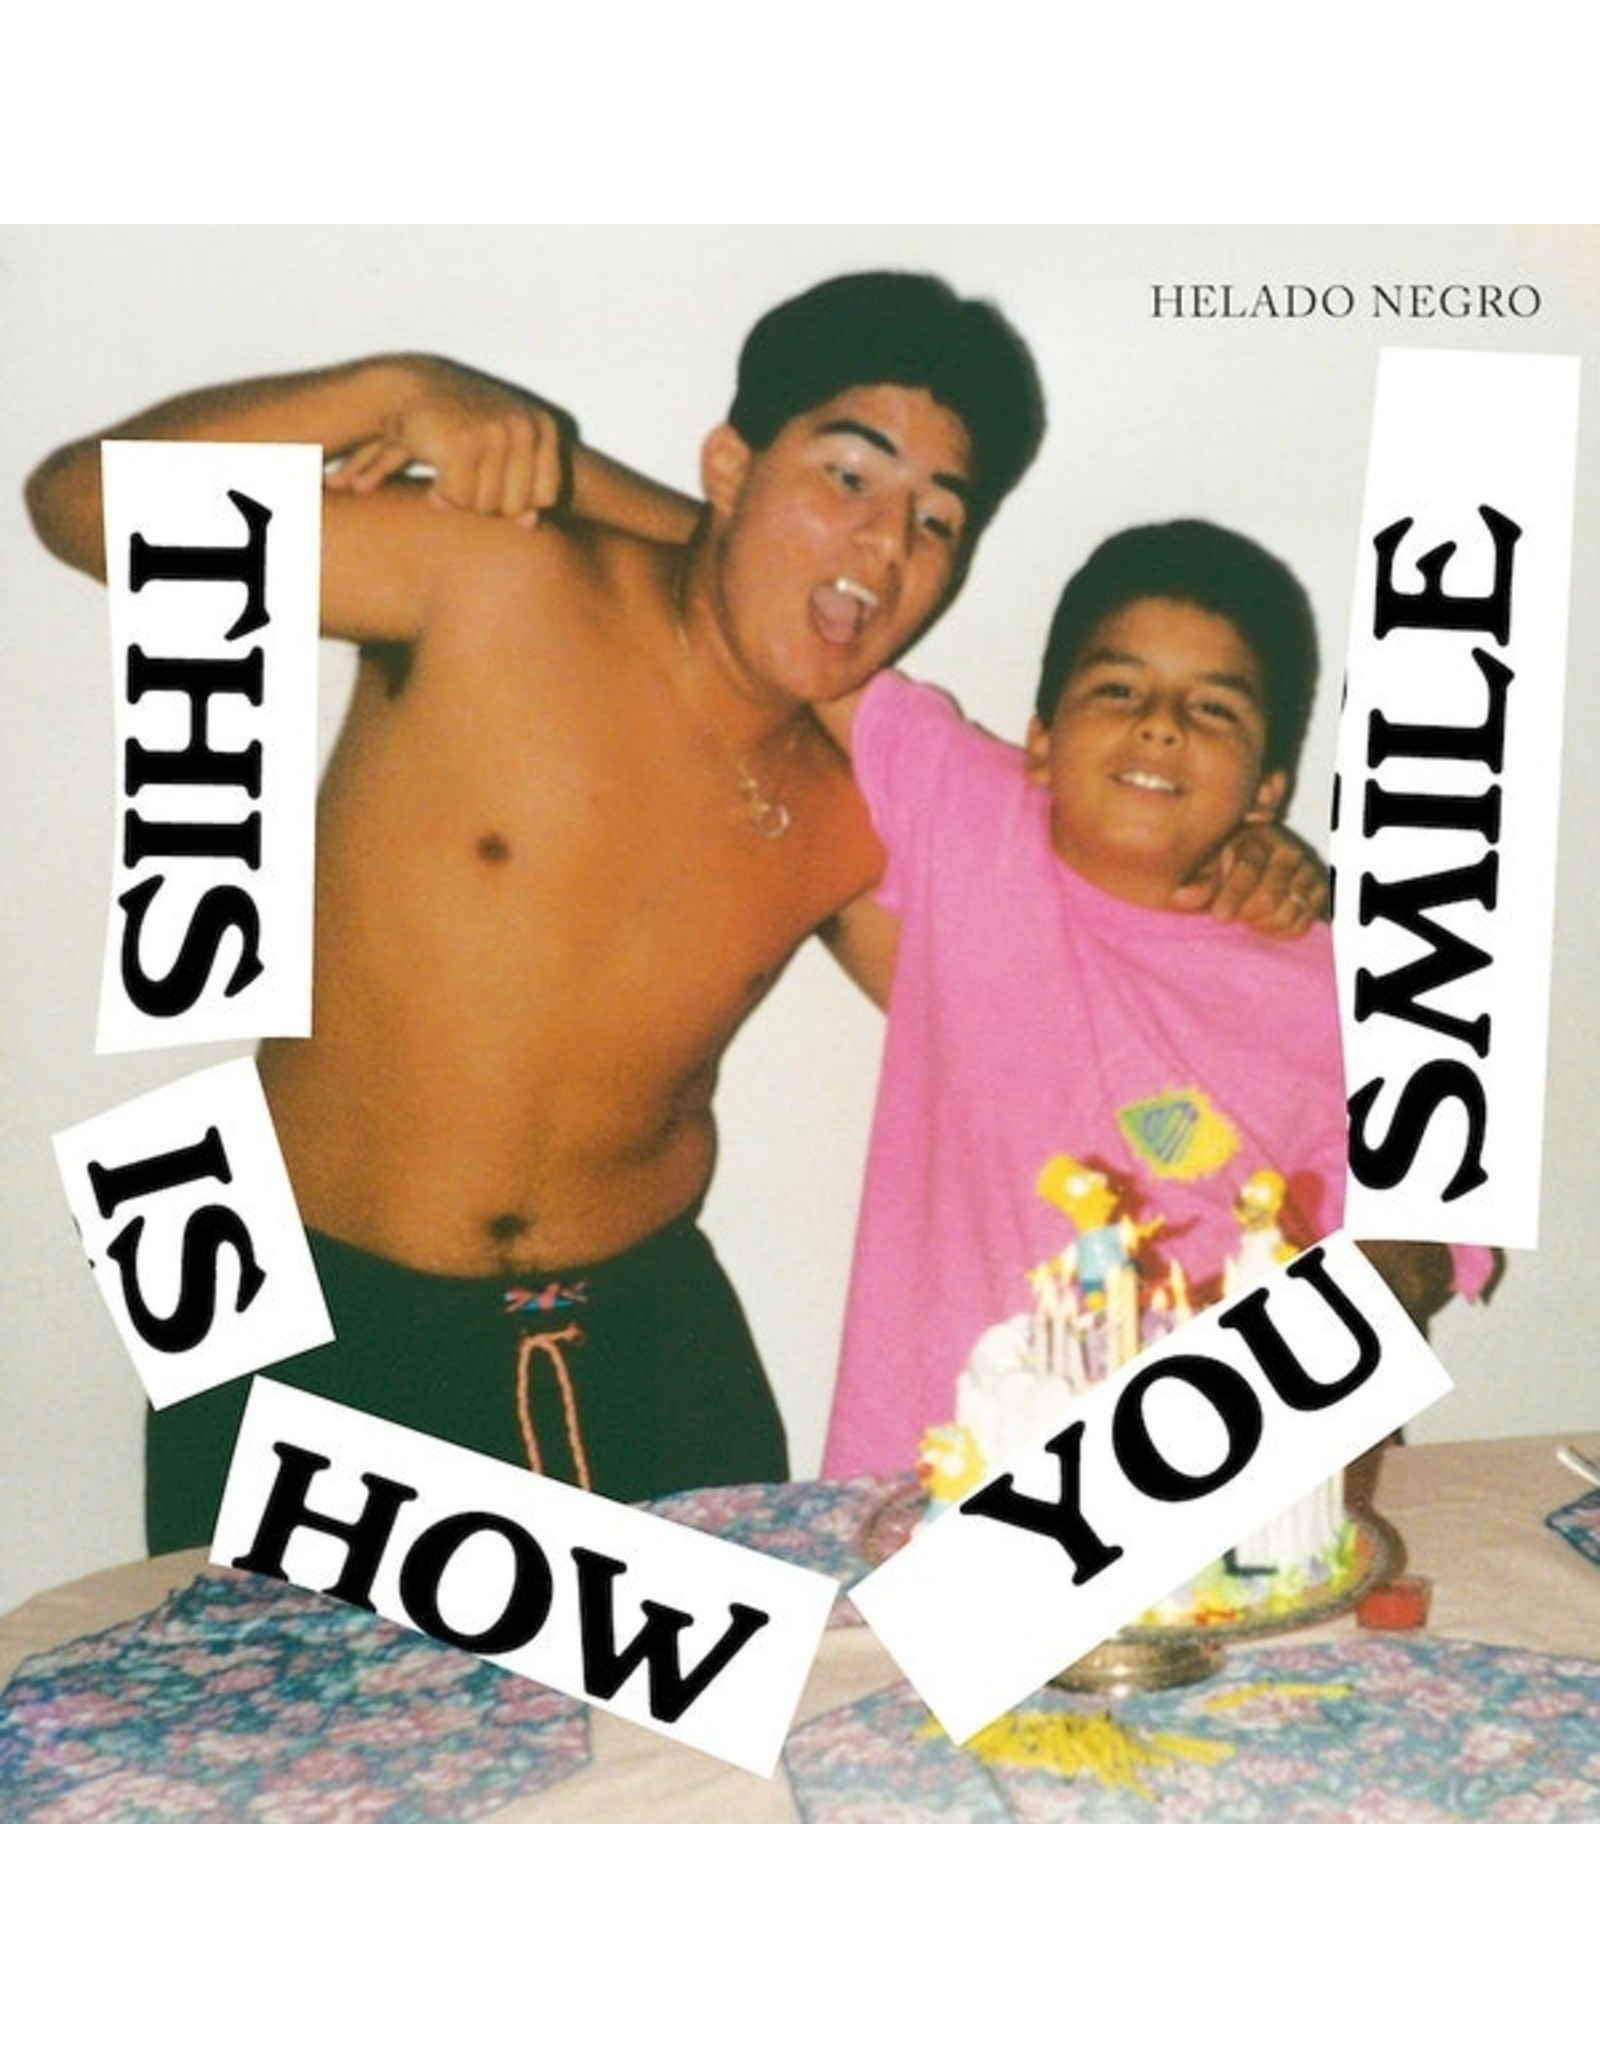 New Vinyl Helado Negro - This Is How You Smile LP